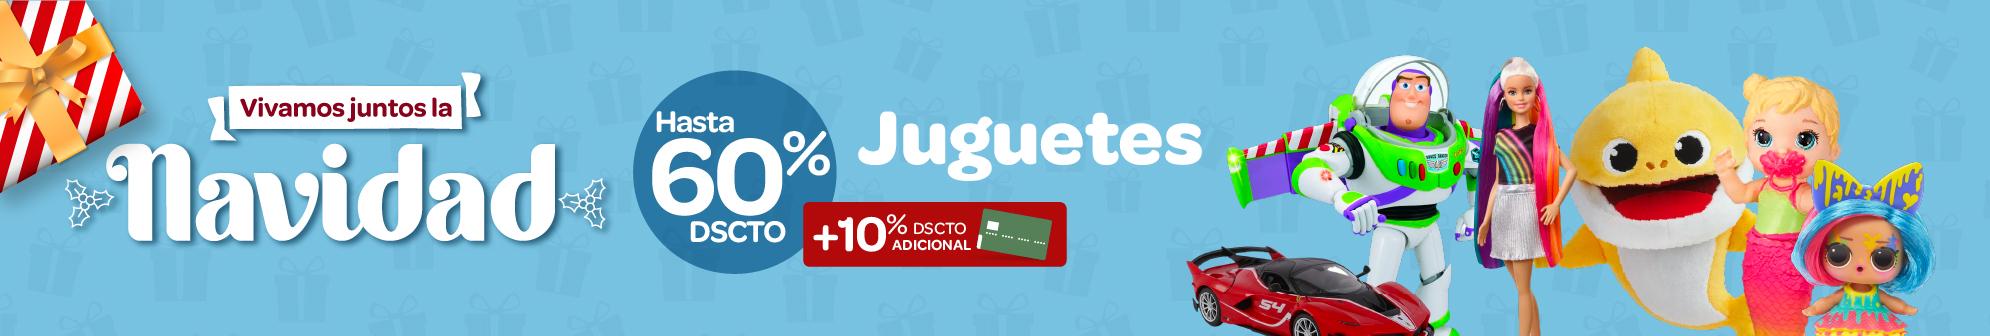 Banner Juguetes